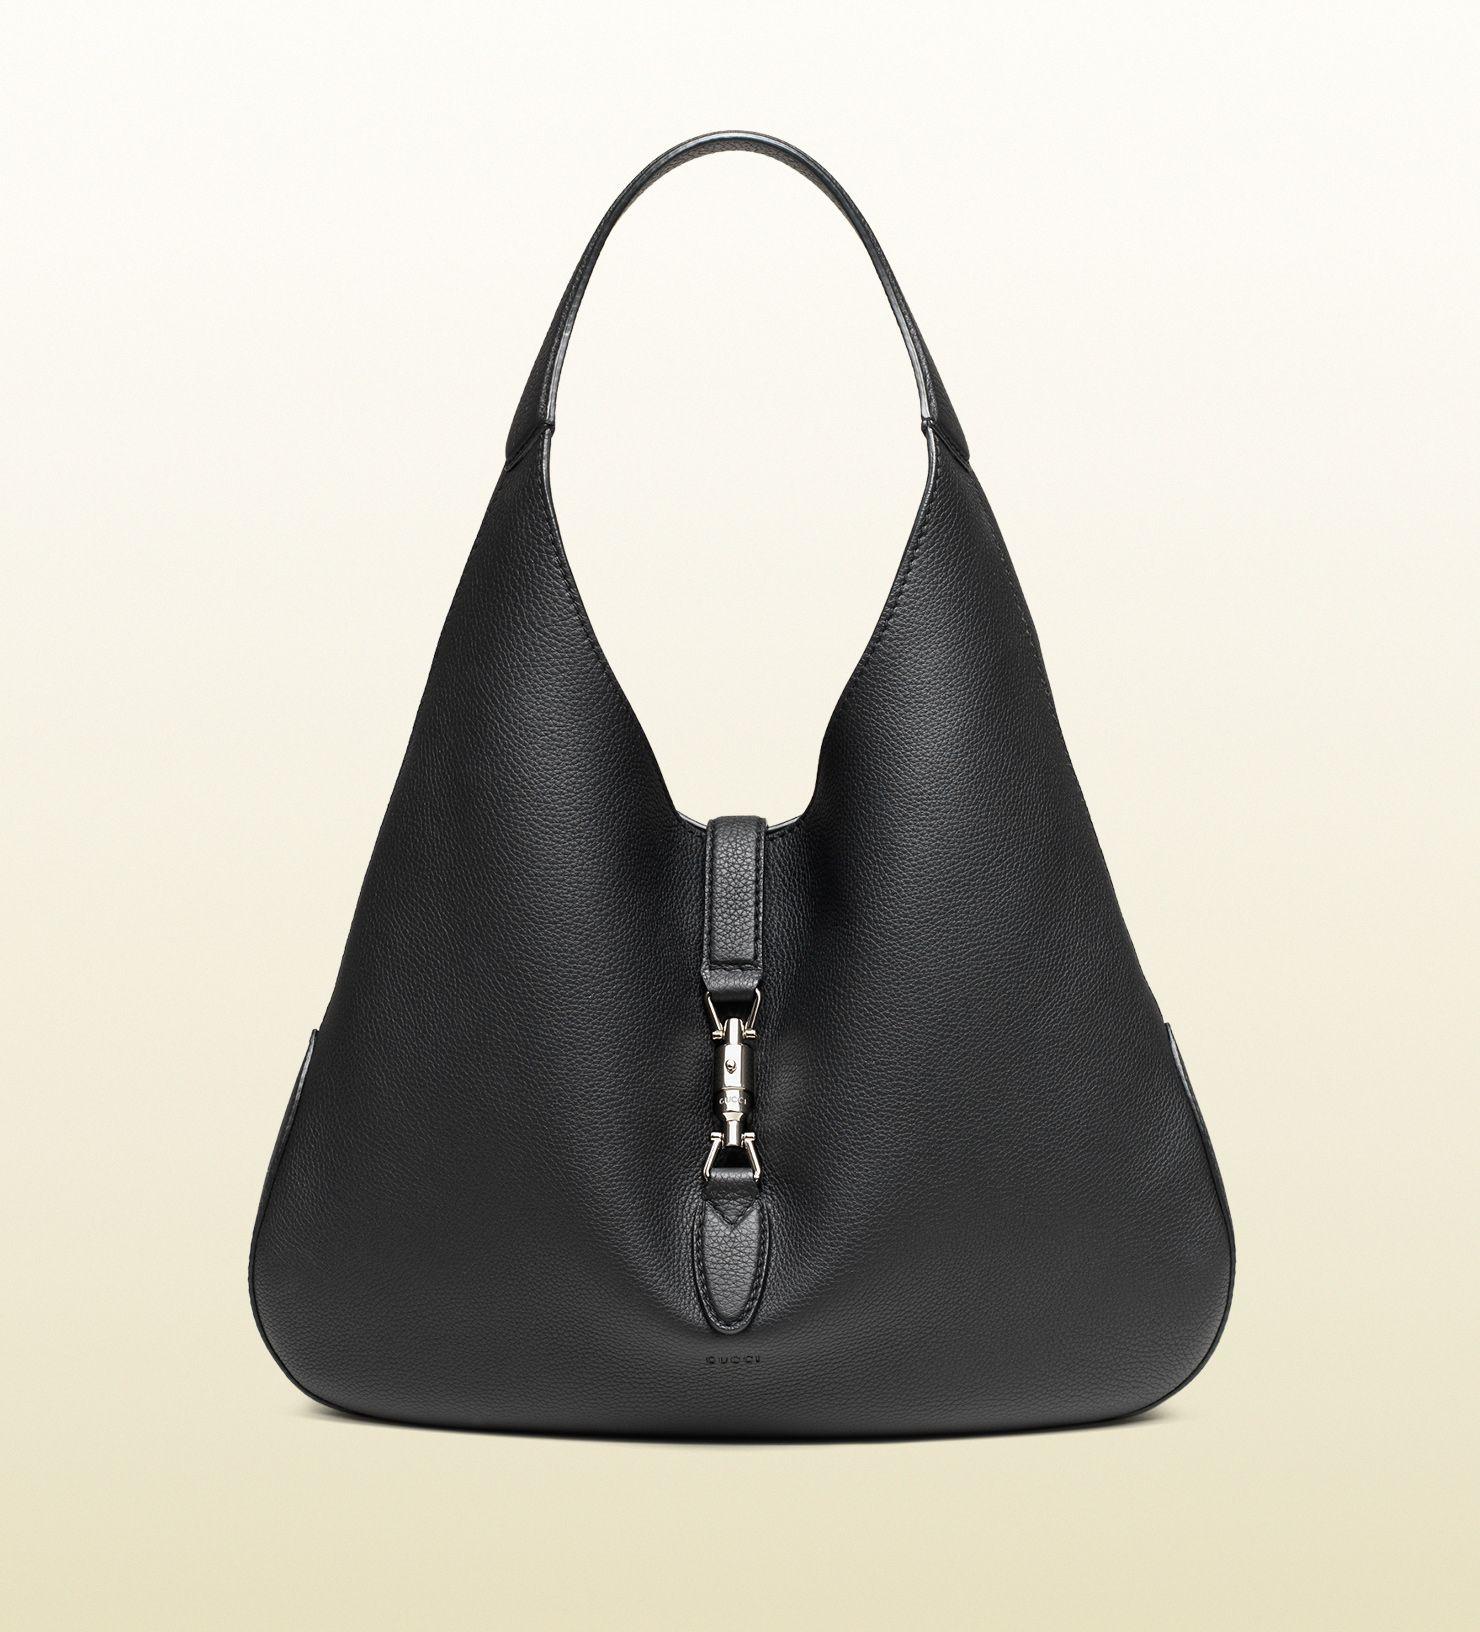 f4f92db0c1a6 Gucci Jackie Soft Leather Black Hobo   2